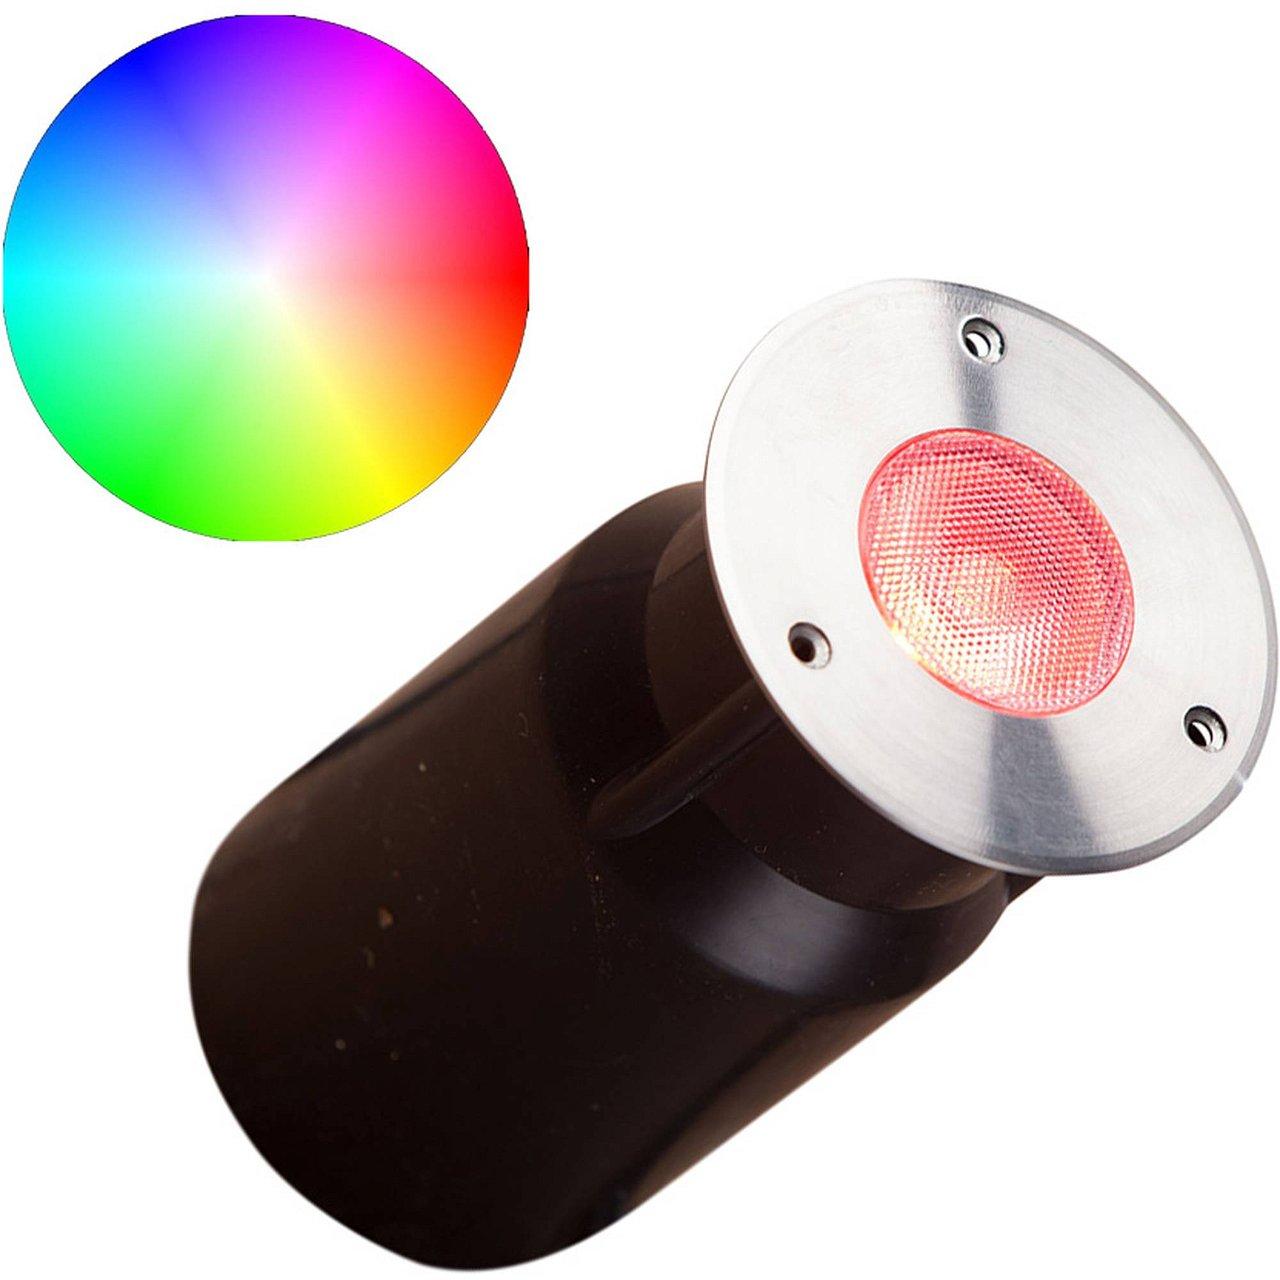 Heissner L463-00 Smart Light RGB Bodeneinbau Spot und Decklight 1 Watt silber